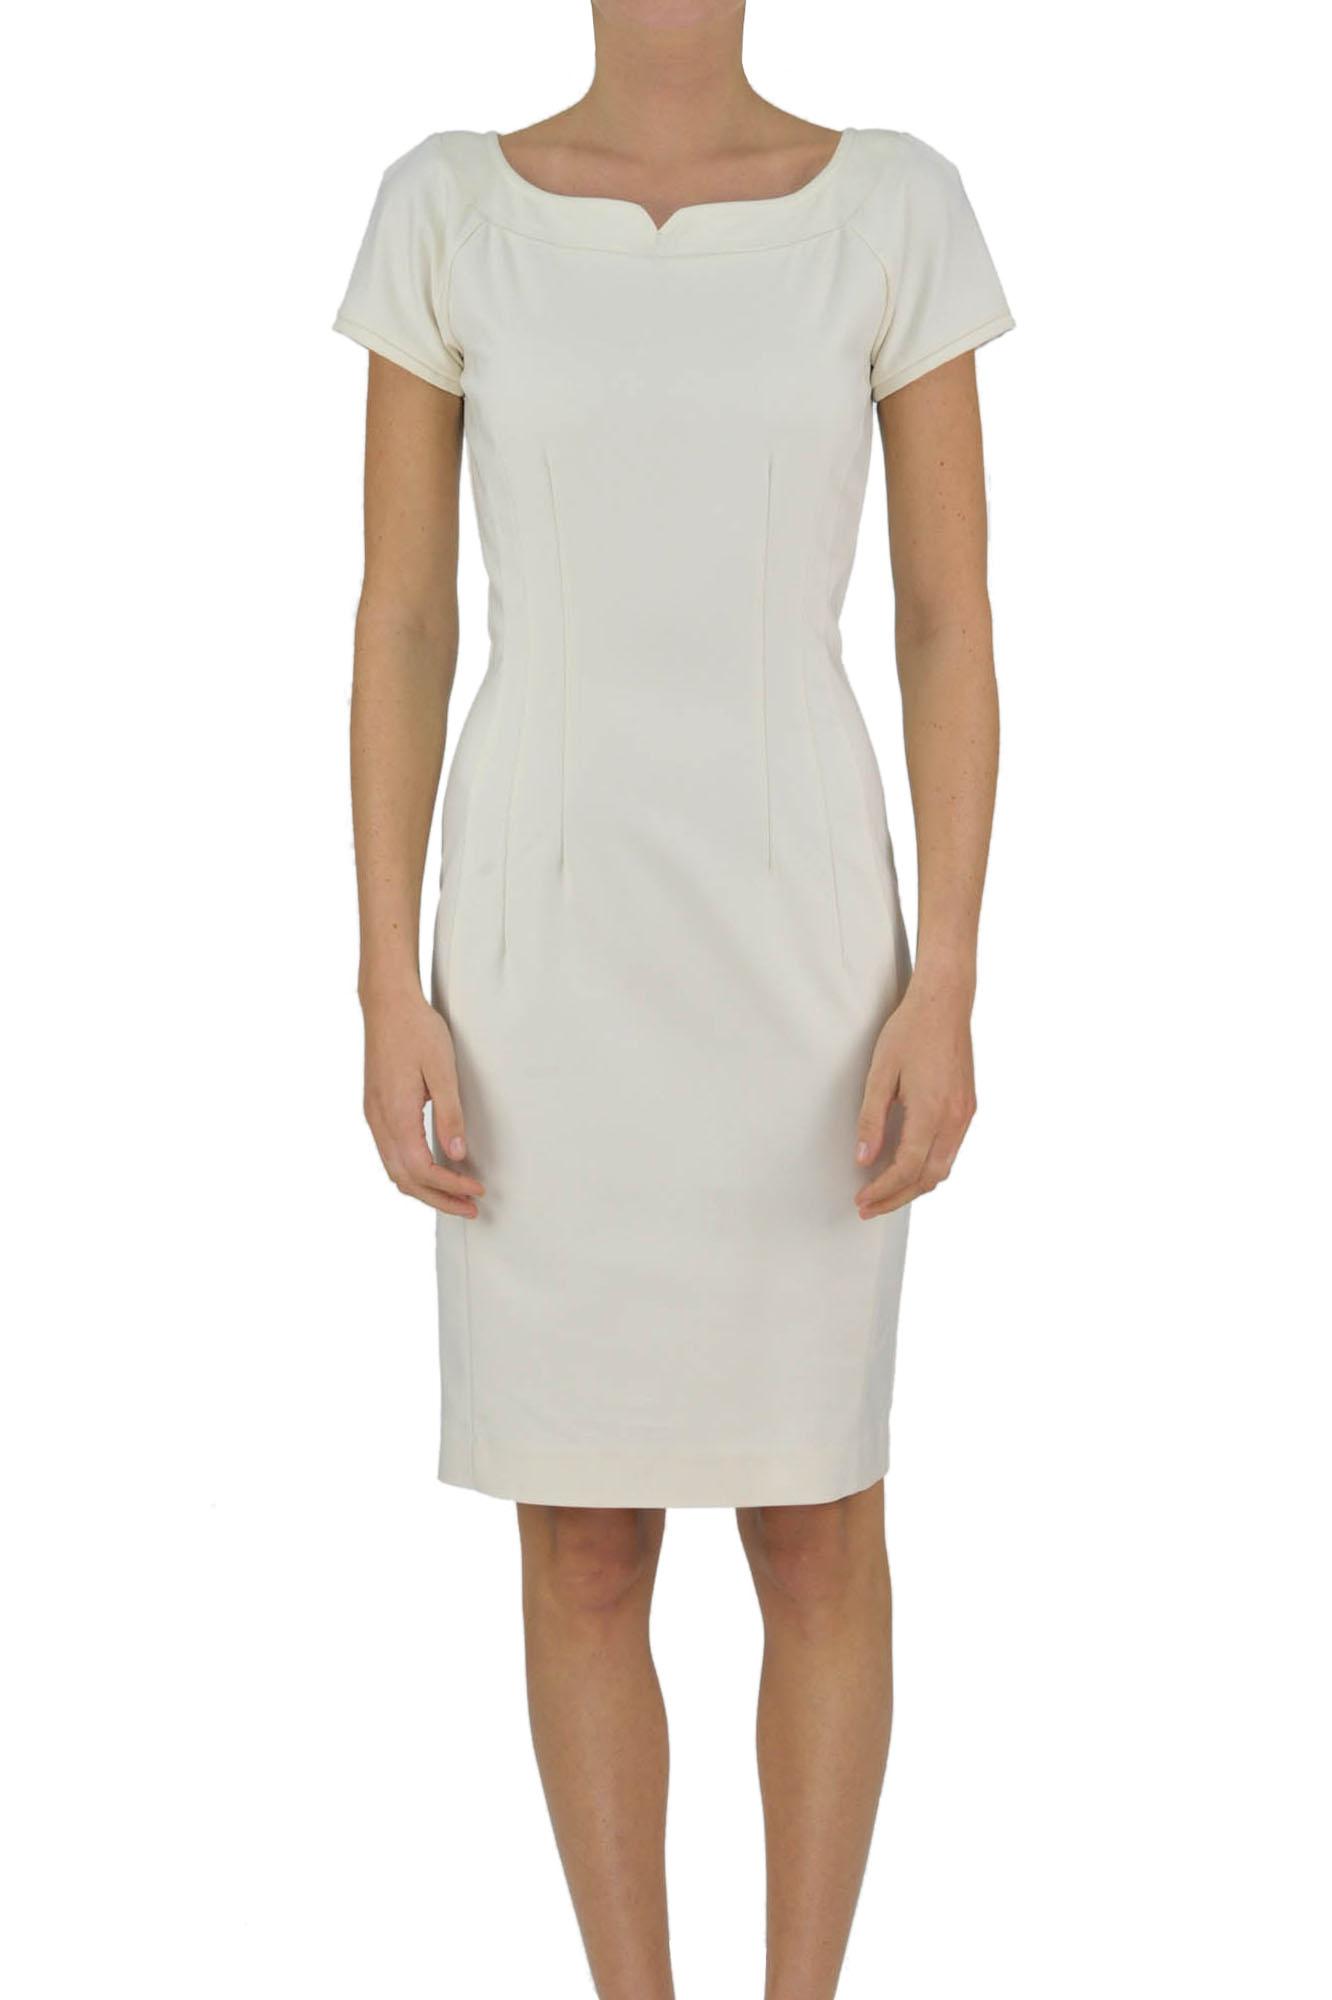 newest 528a5 6c345 Sheath dress